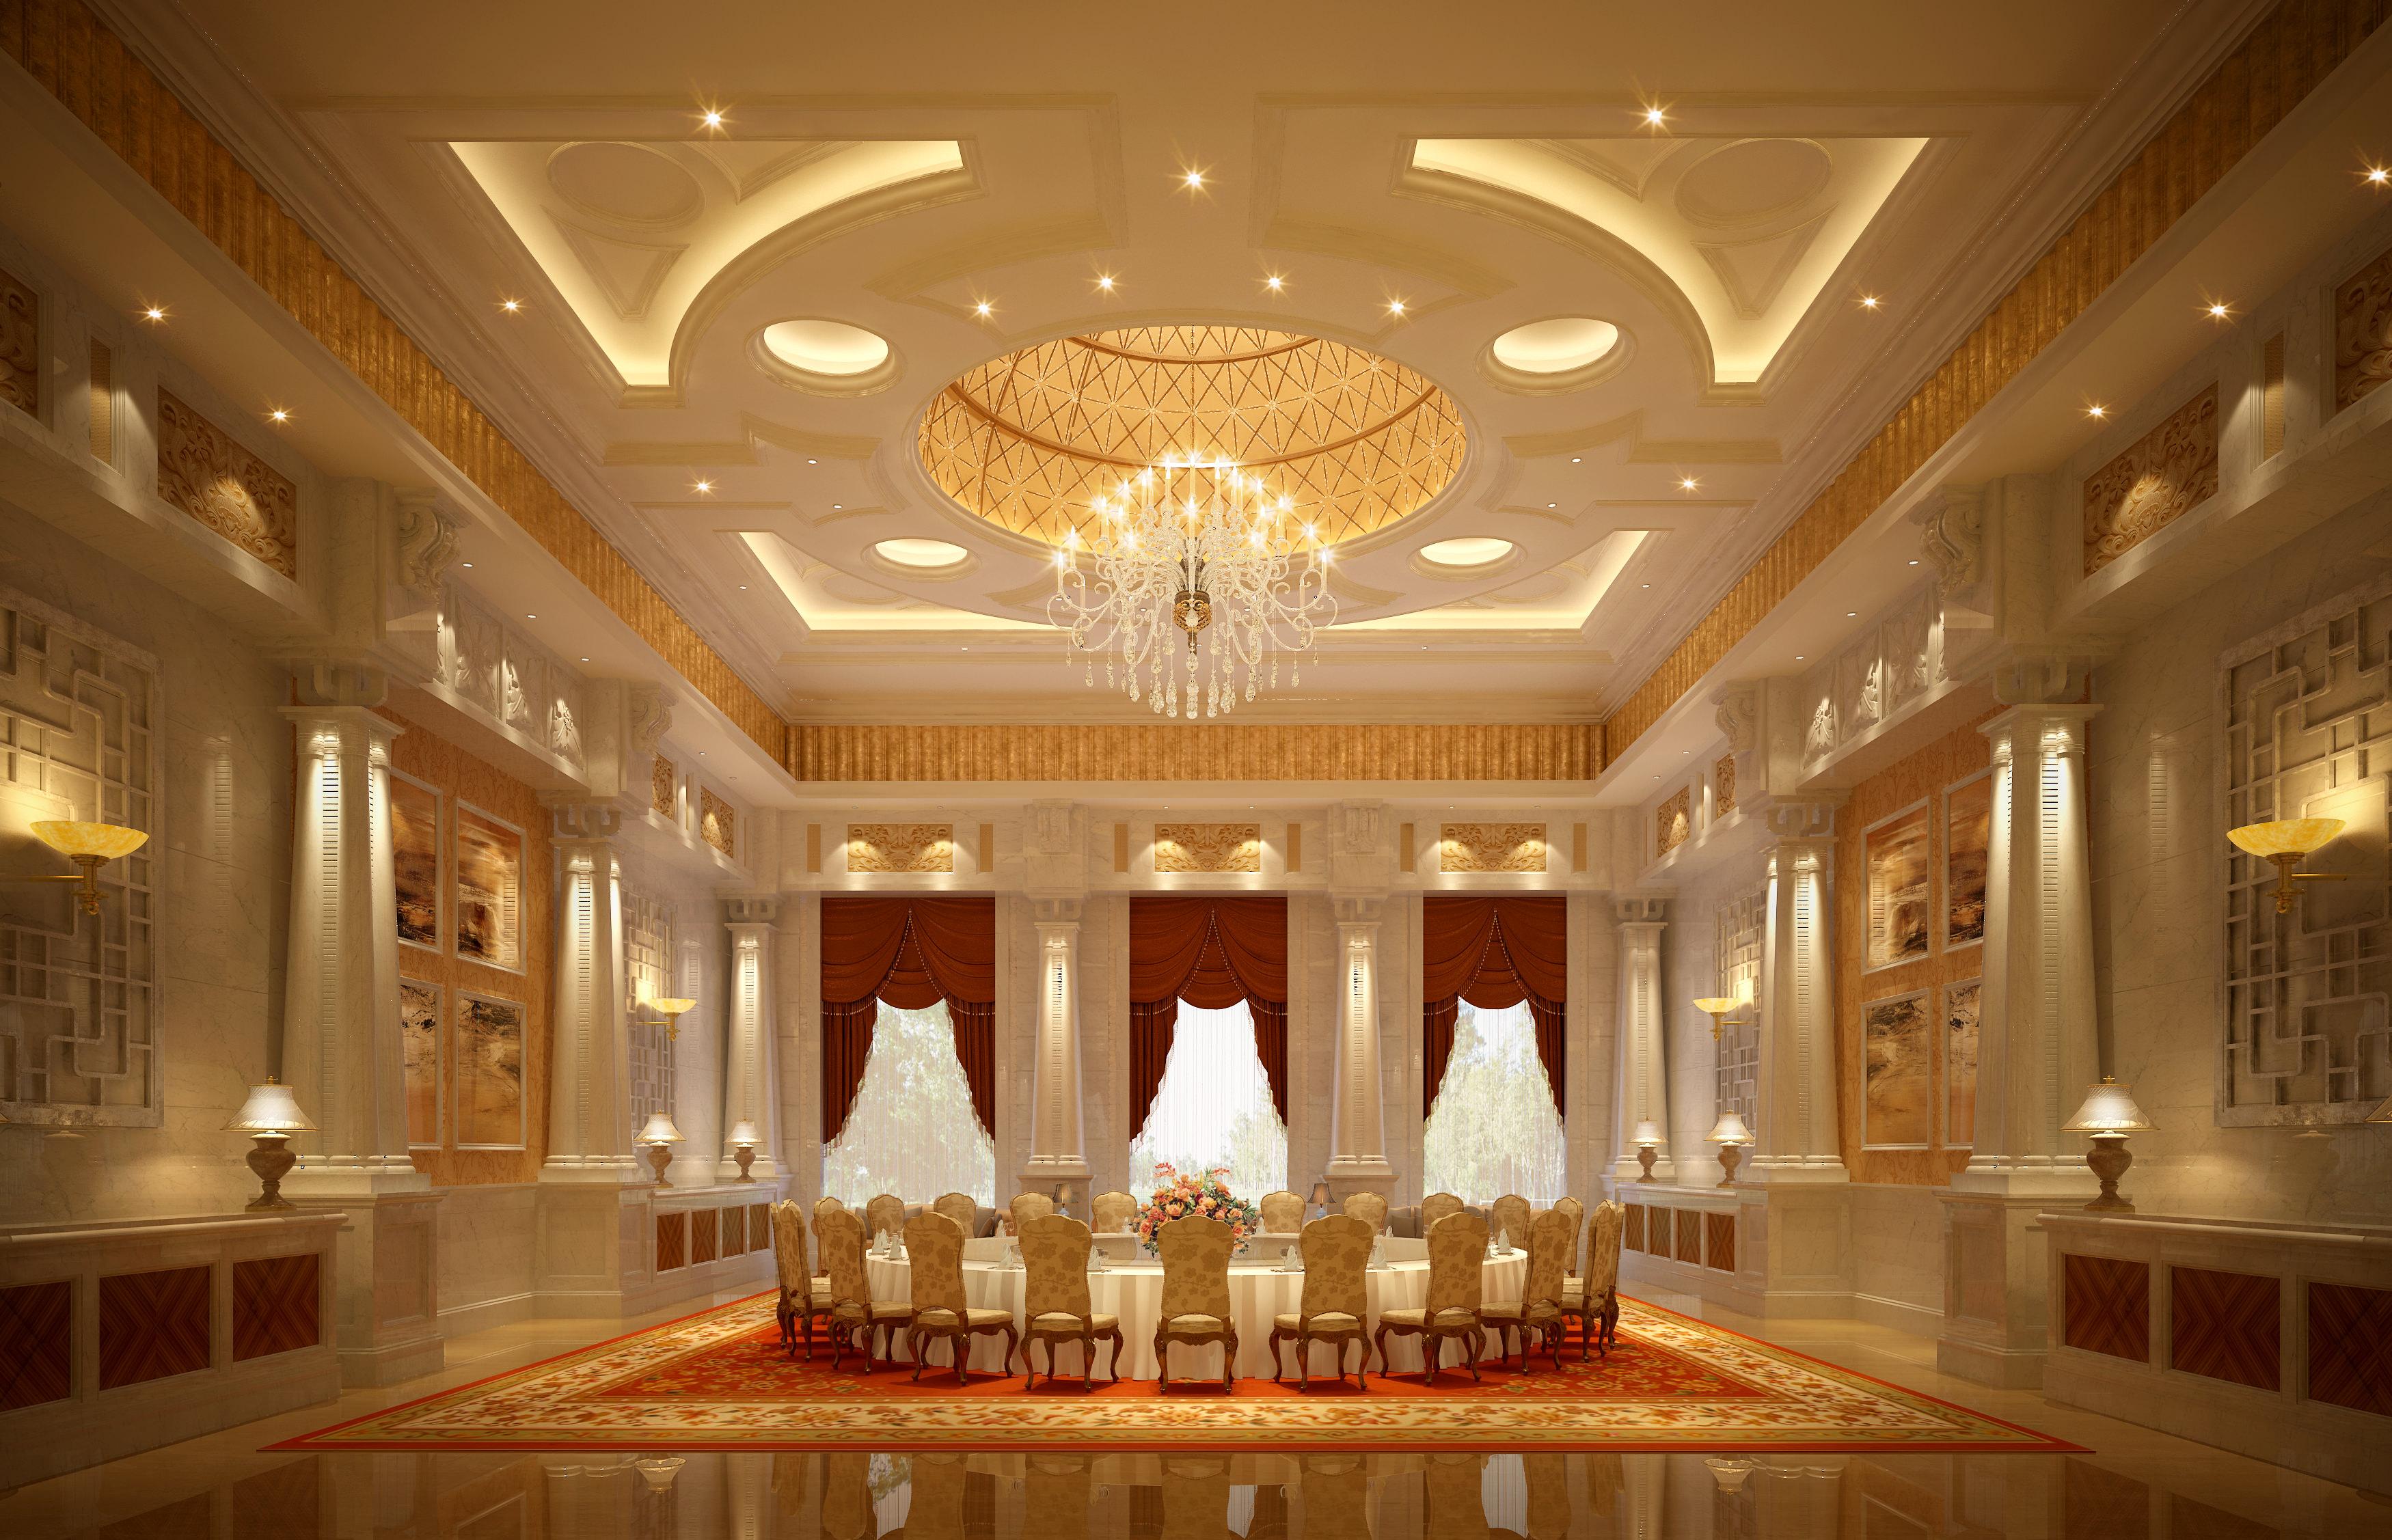 posh restaurant with luxury lighting 3d model max 1 ... & Posh Restaurant with Luxury Lighting 3D   CGTrader azcodes.com